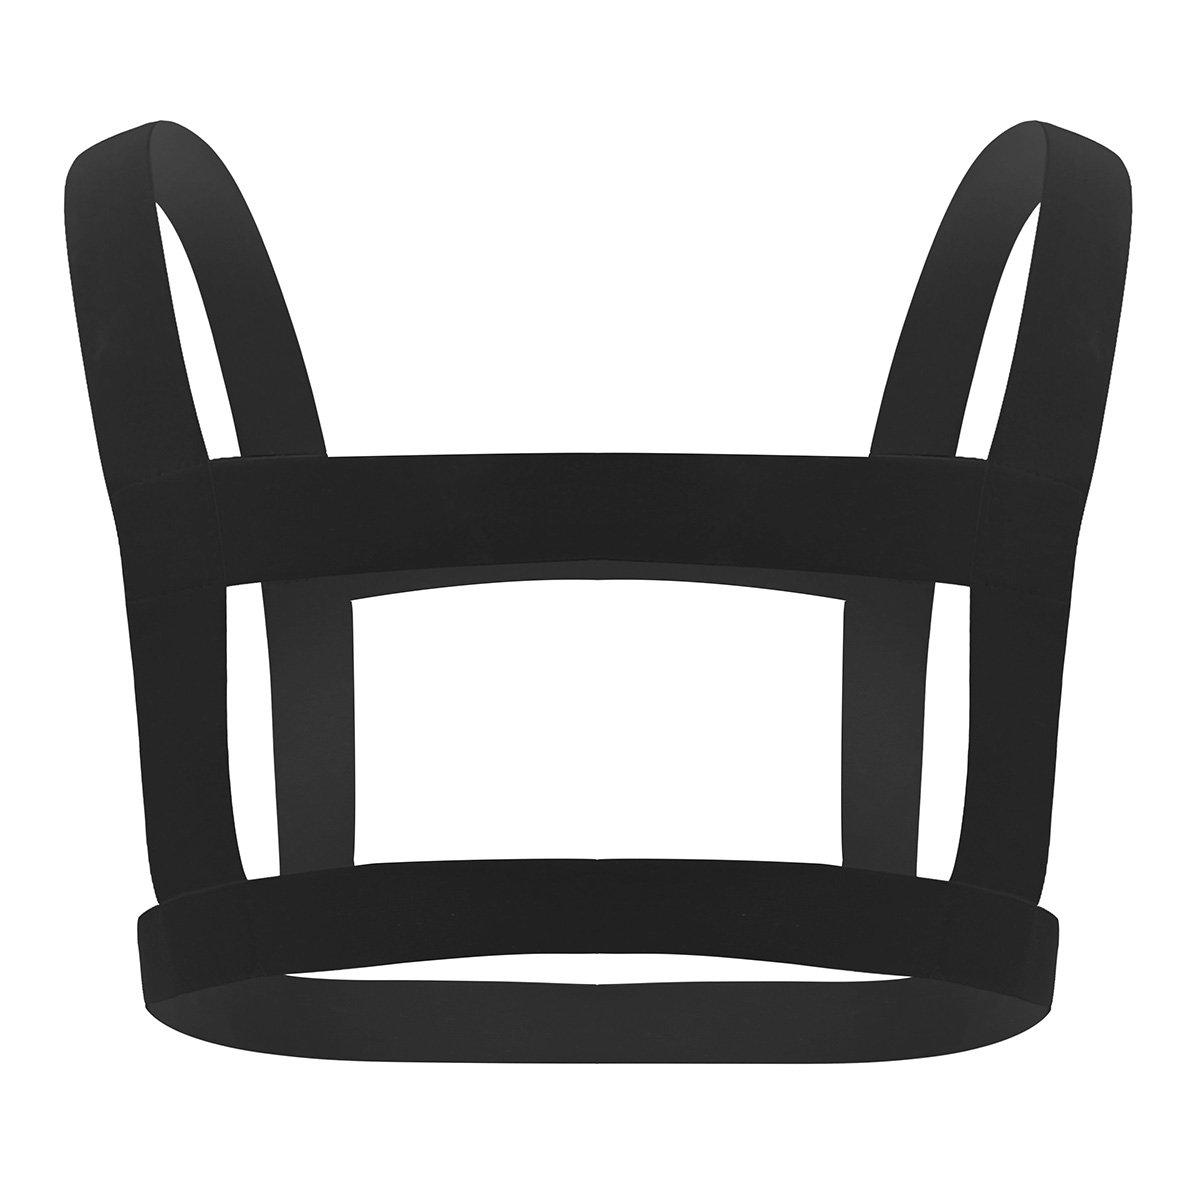 IEFIEL Men Nylon Halter Neck Elastic Body Chest Harness Costume Belt Black B One Size